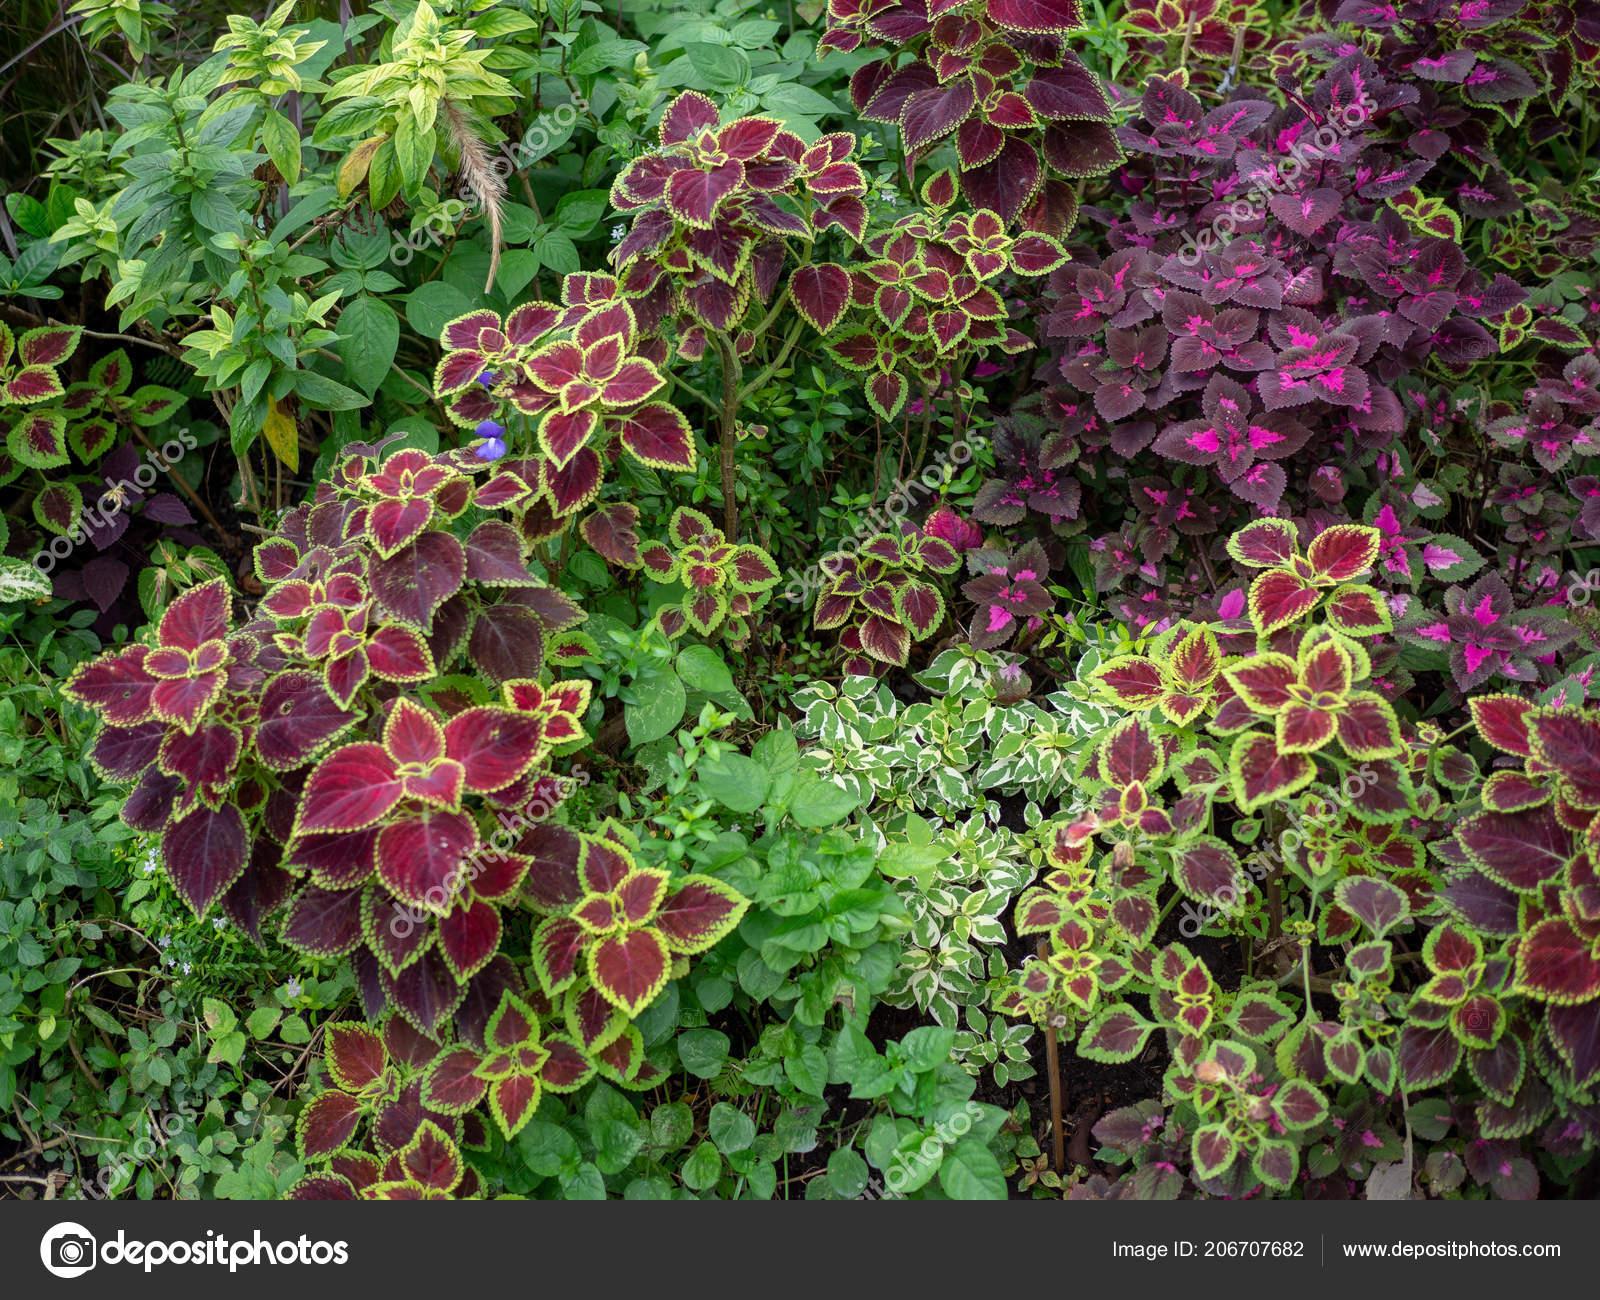 Small Jungle Living Outdoor Tropical Evergreen Garden Plants Root